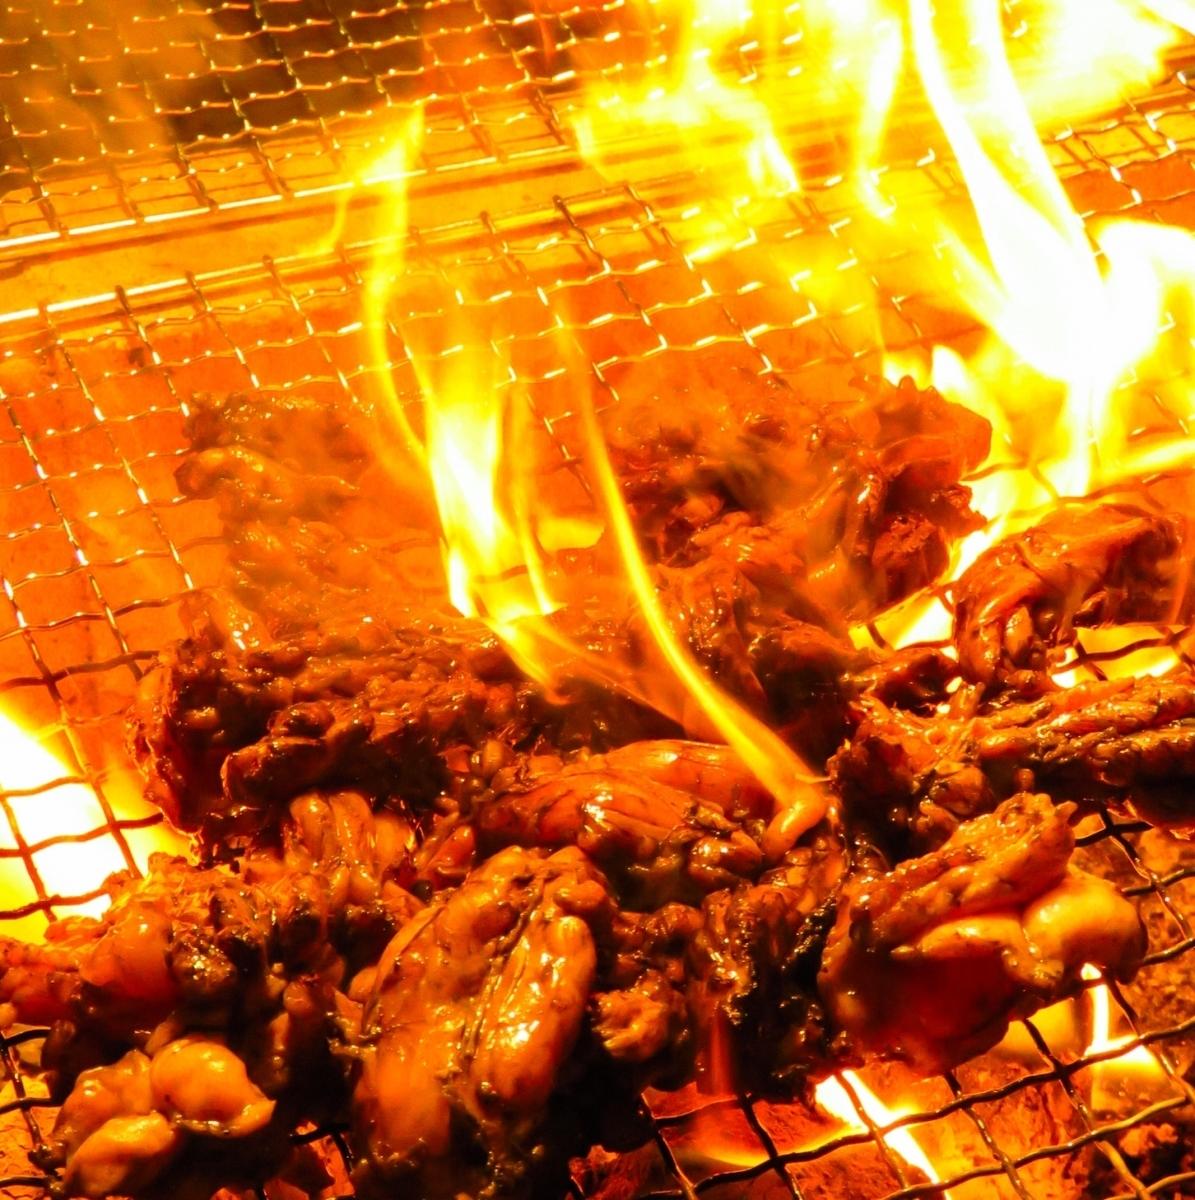 Charcoal grilling of Troseseri